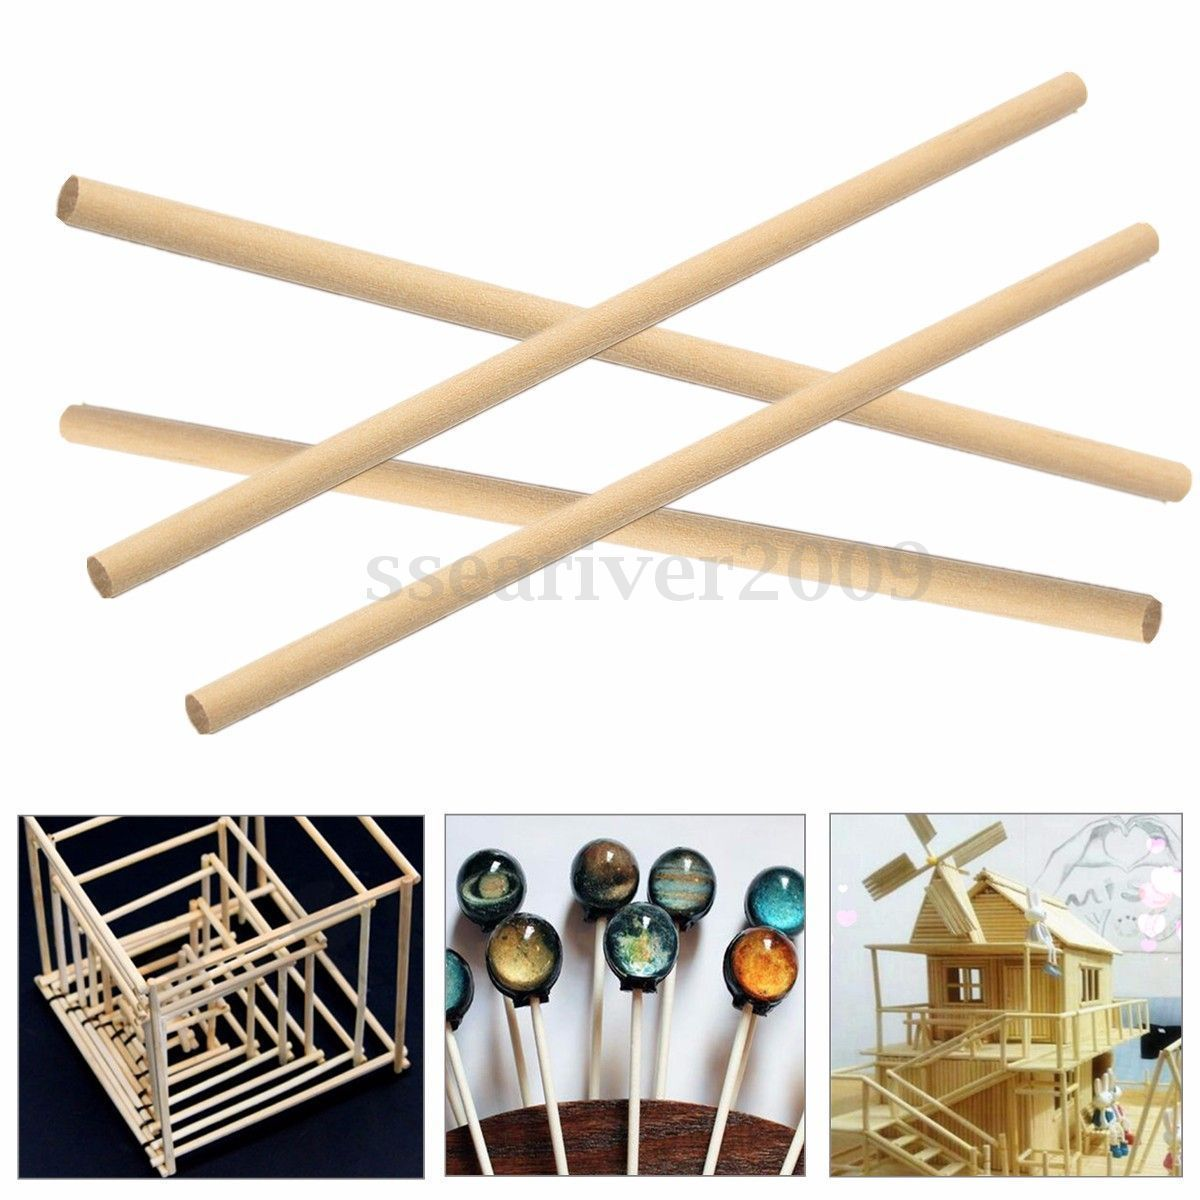 Round wooden sticks for crafts - 50pcs 150mm Round Wooden Lollipop Lolly Sticks Cake Dowels For Diy Food Crafts